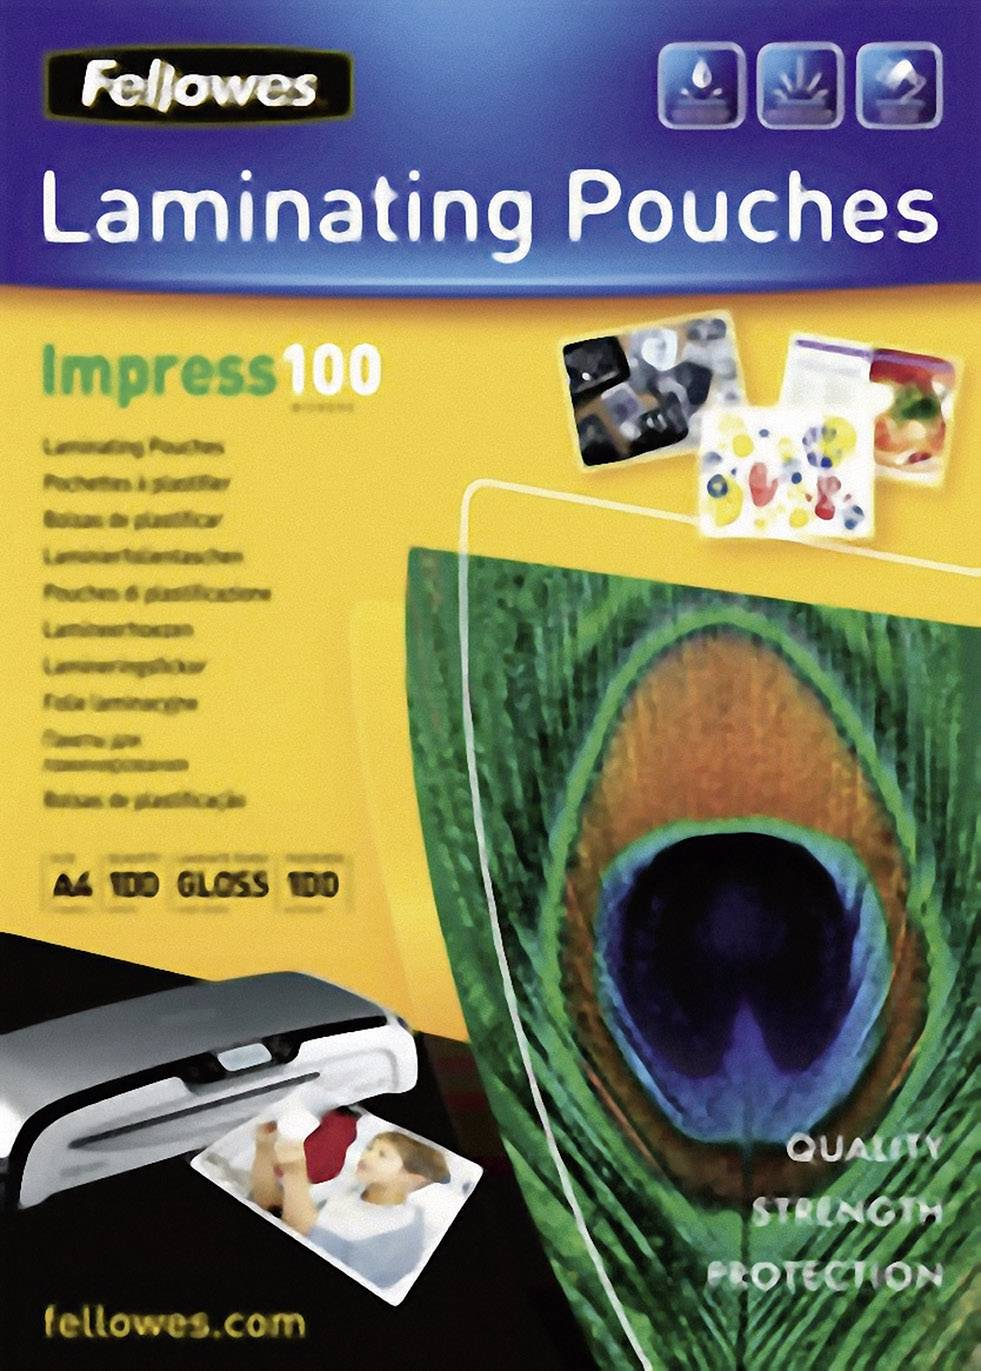 Laminovacie fólie Fellowes DIN A4 100 micron lesklý 100 ks